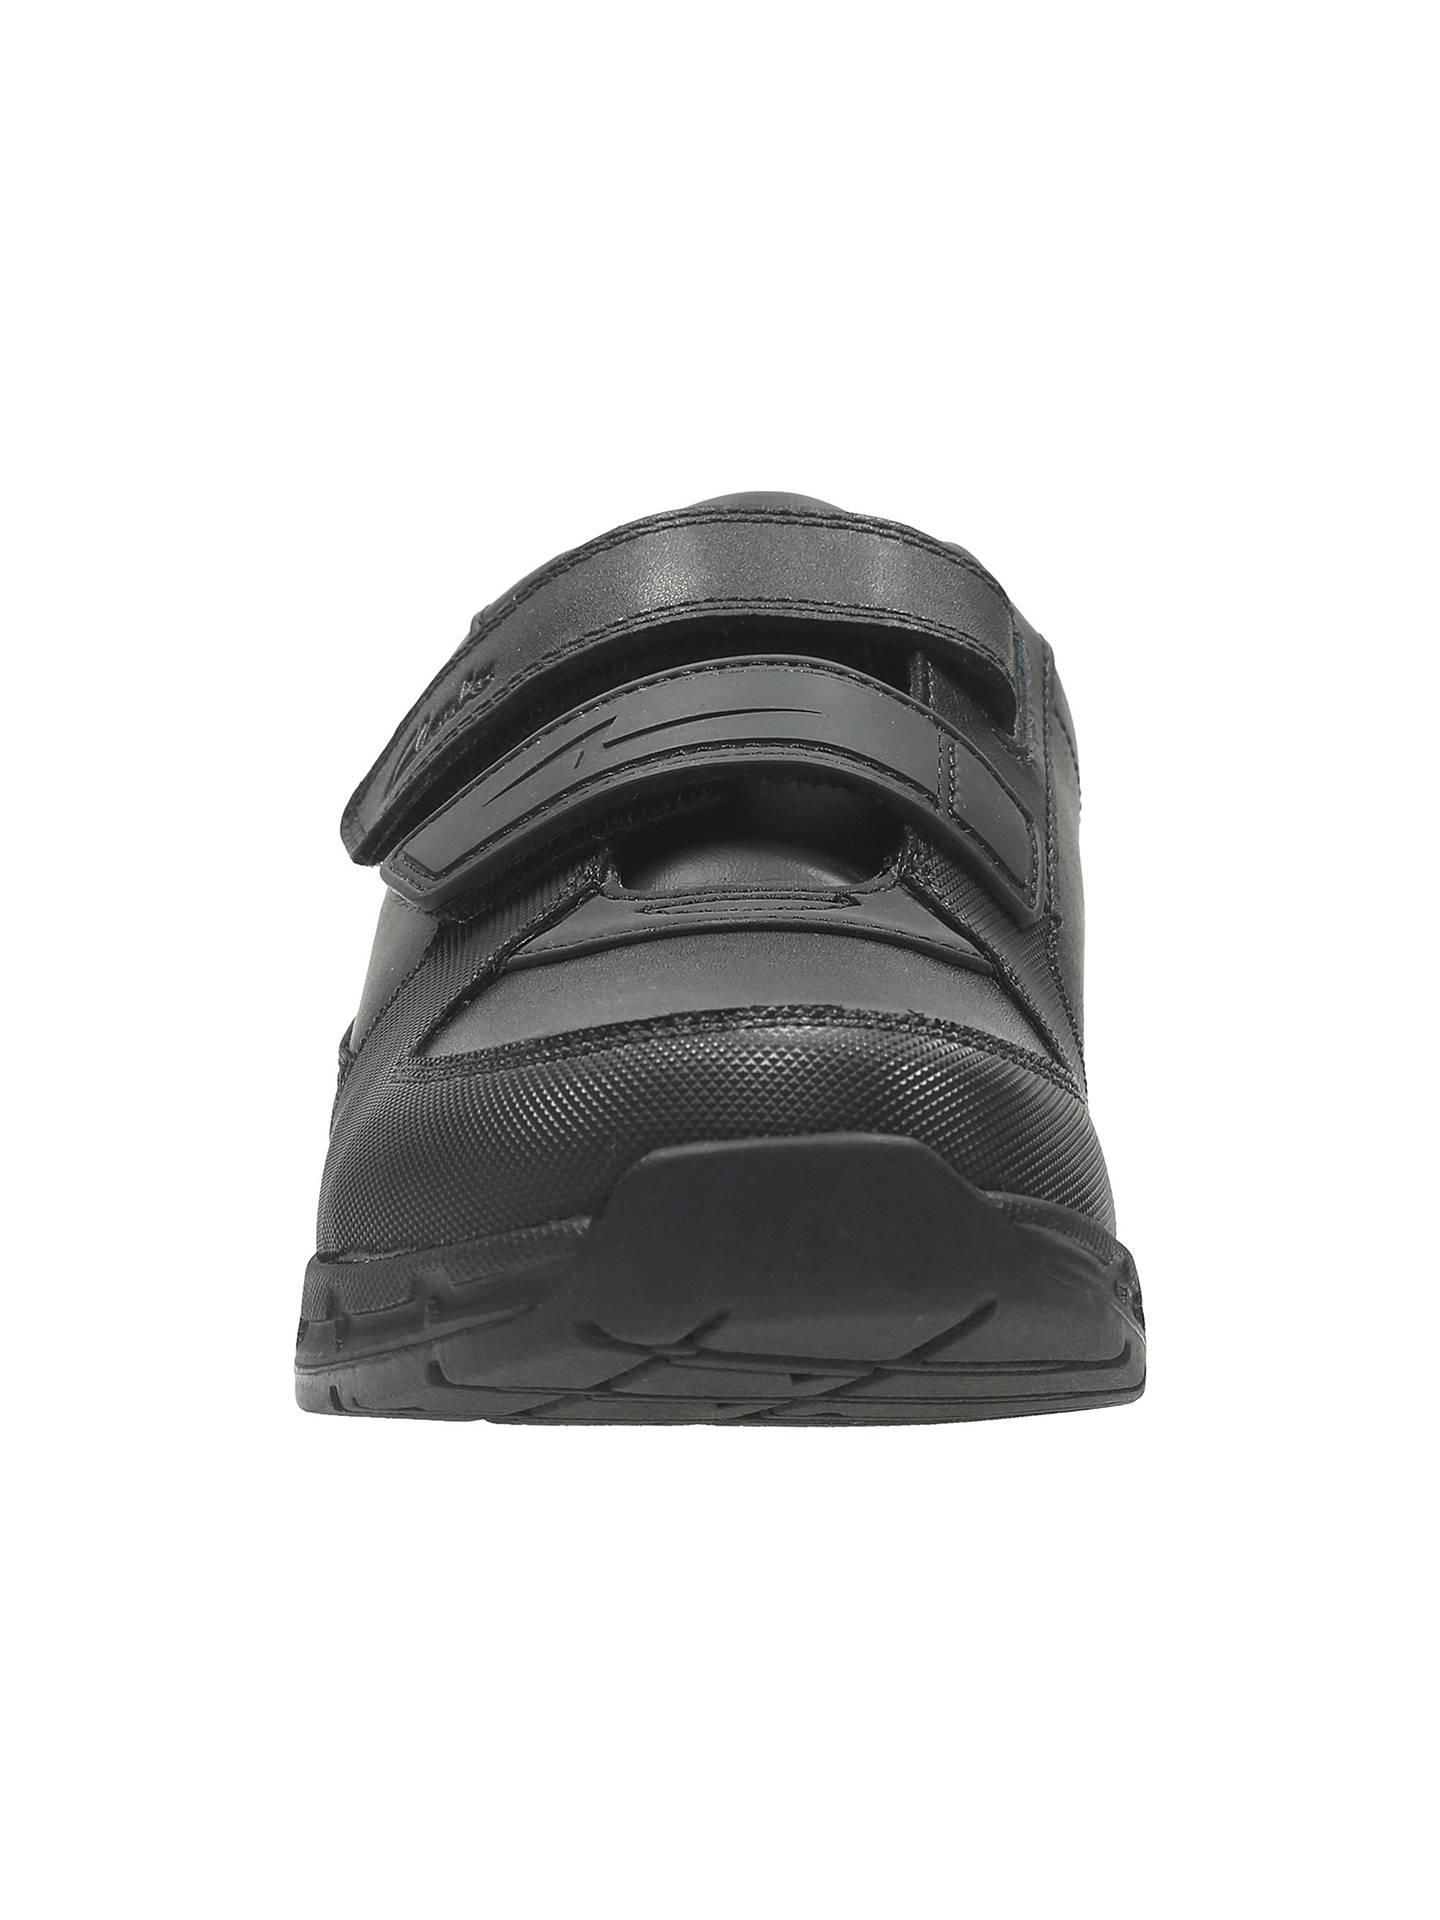 0d52344c ... Buy Clarks Children's Gloforms Maris Fire Junior School Shoes, Black,  13E Online at johnlewis ...